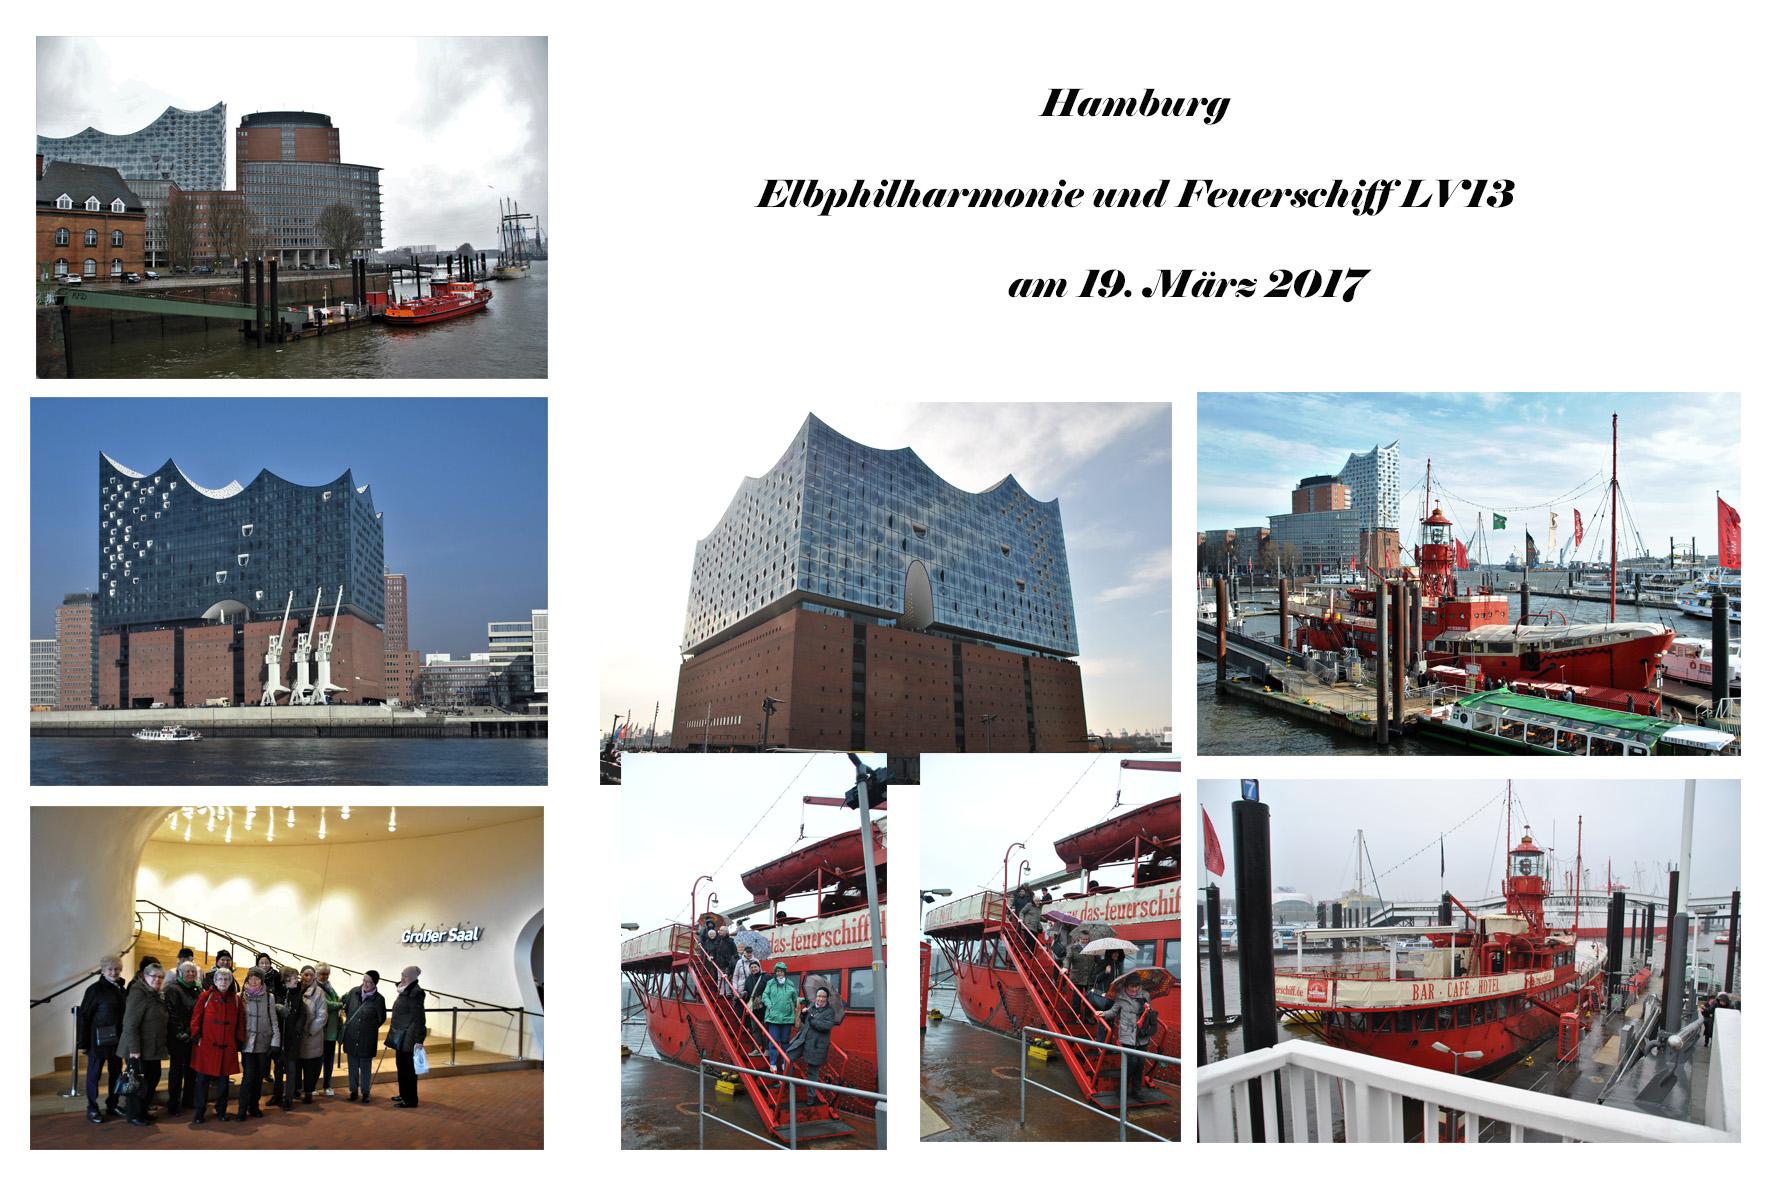 NeNo/Glashütte 2: Elbphilharmonie & Feuerschiff LV13, 19.03.2017 (Fotos: Tom)